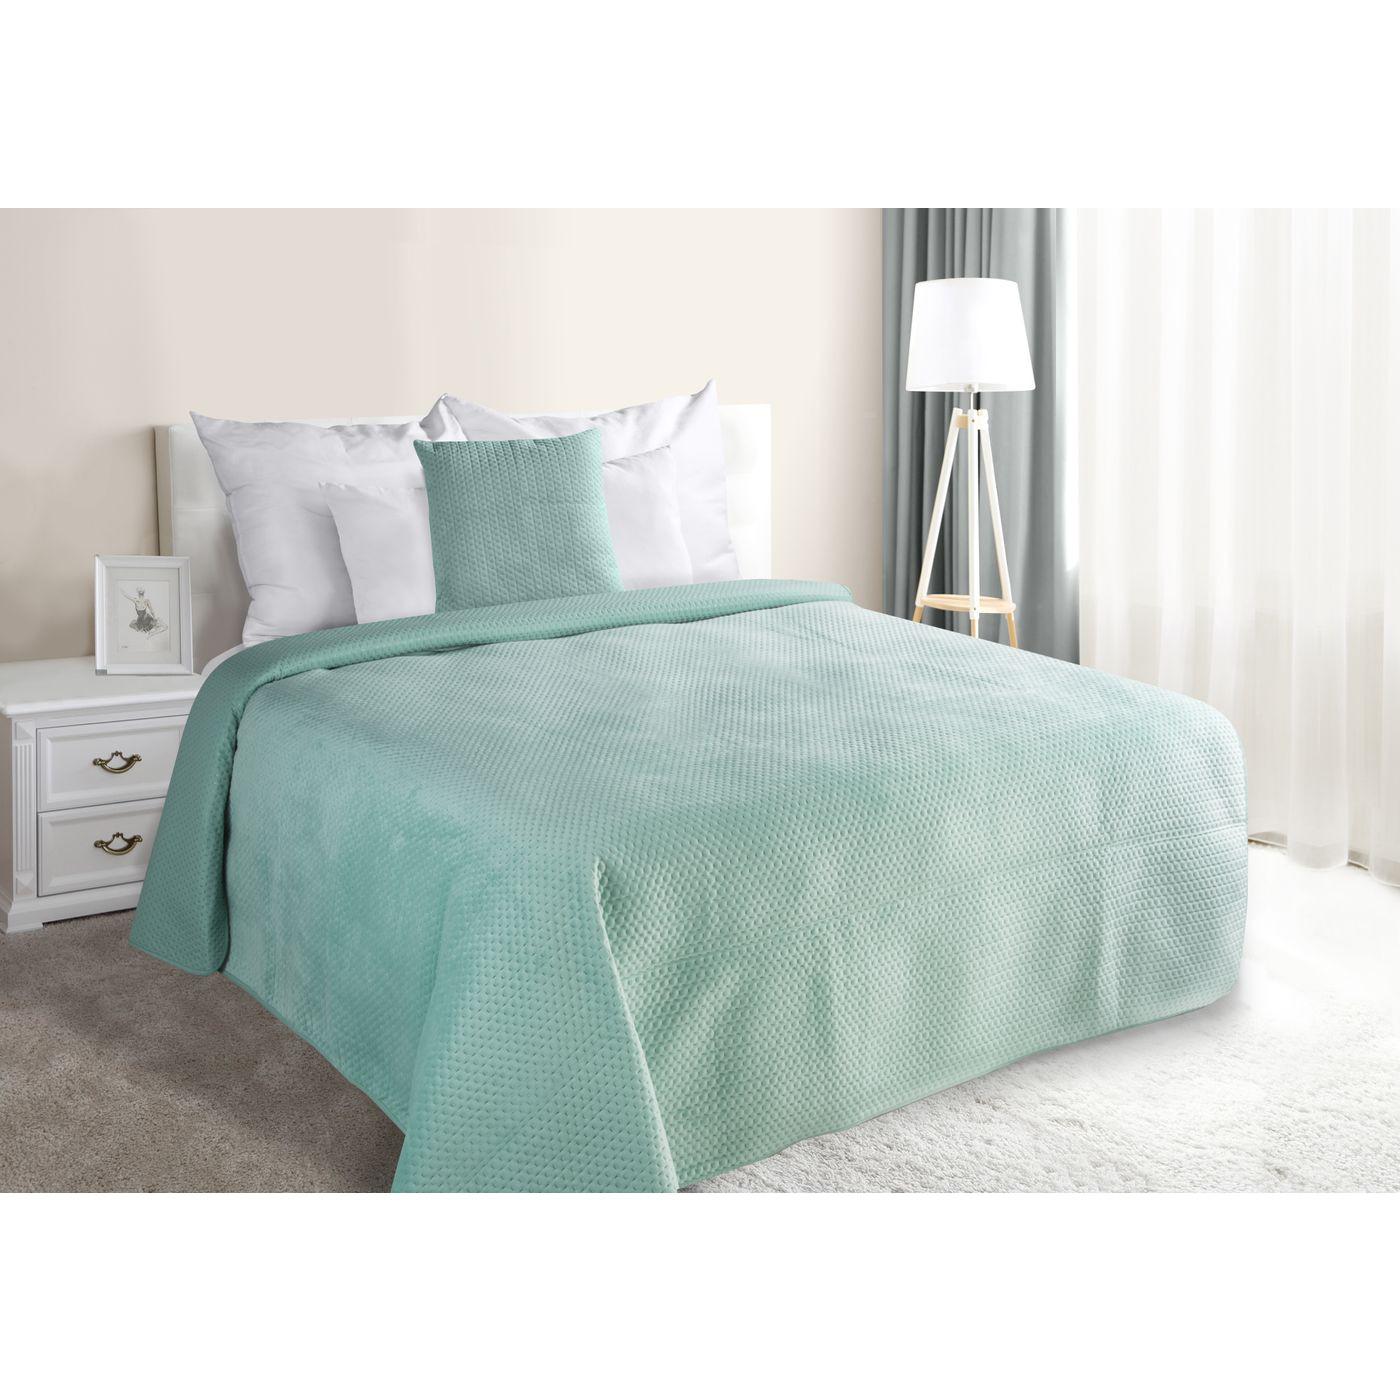 Narzuta na łóżko welwetowa pikowana hotpress 200x220 cm miętowa